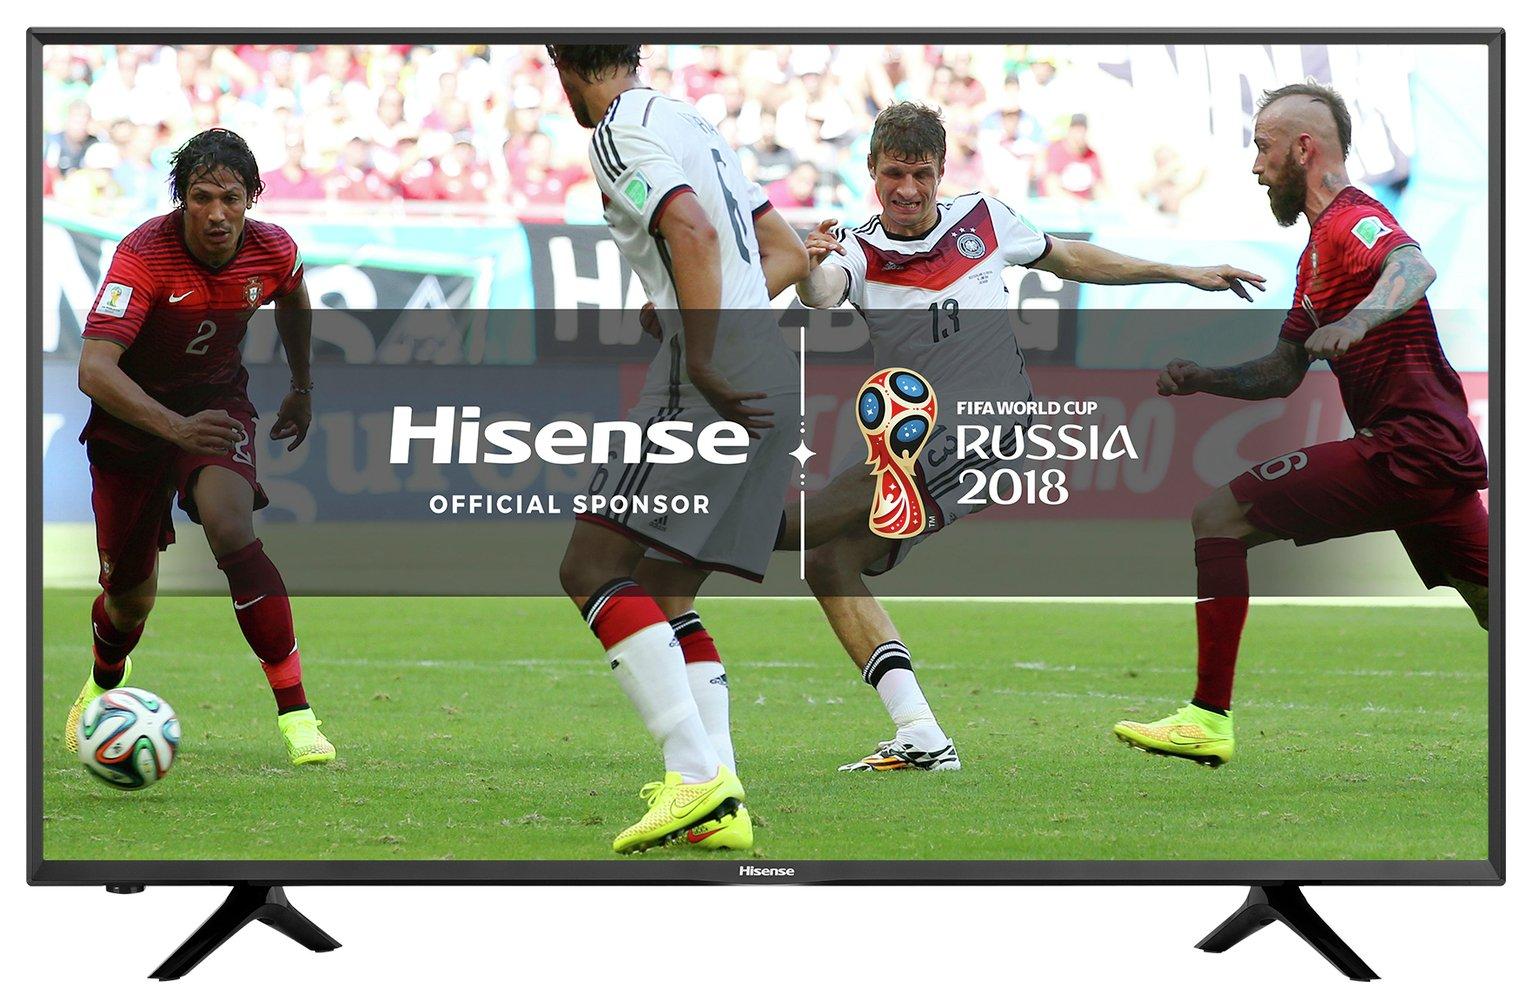 Hisense H65N5300 65 Inch 4K Ultra HD Smart TV